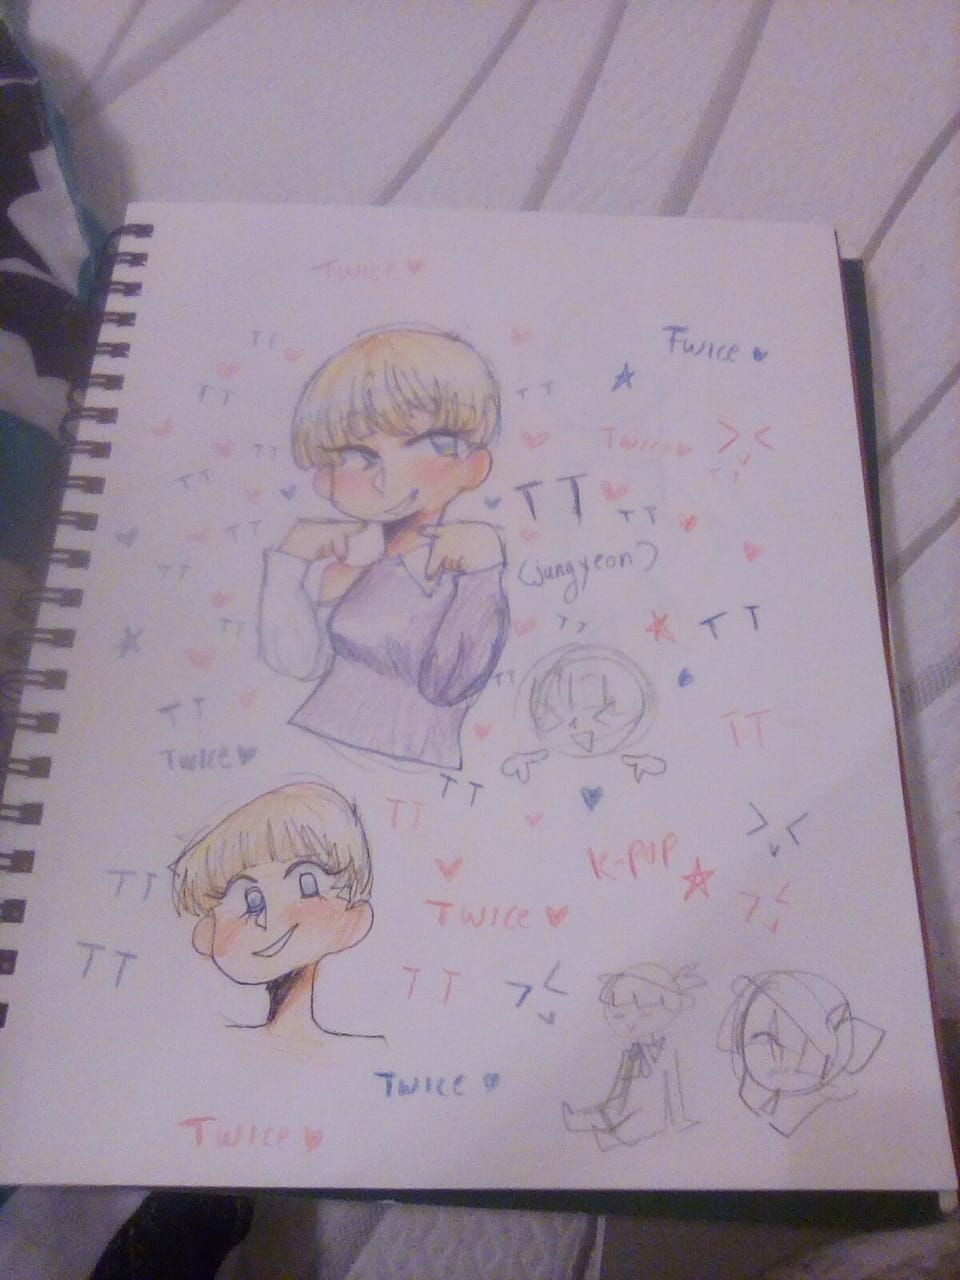 I'm like TT (one hour challenge) Illust of ali-chi | Alus uwu (Fundy Mode) K-pop real onehourchallenge TT TWICE jungyeon